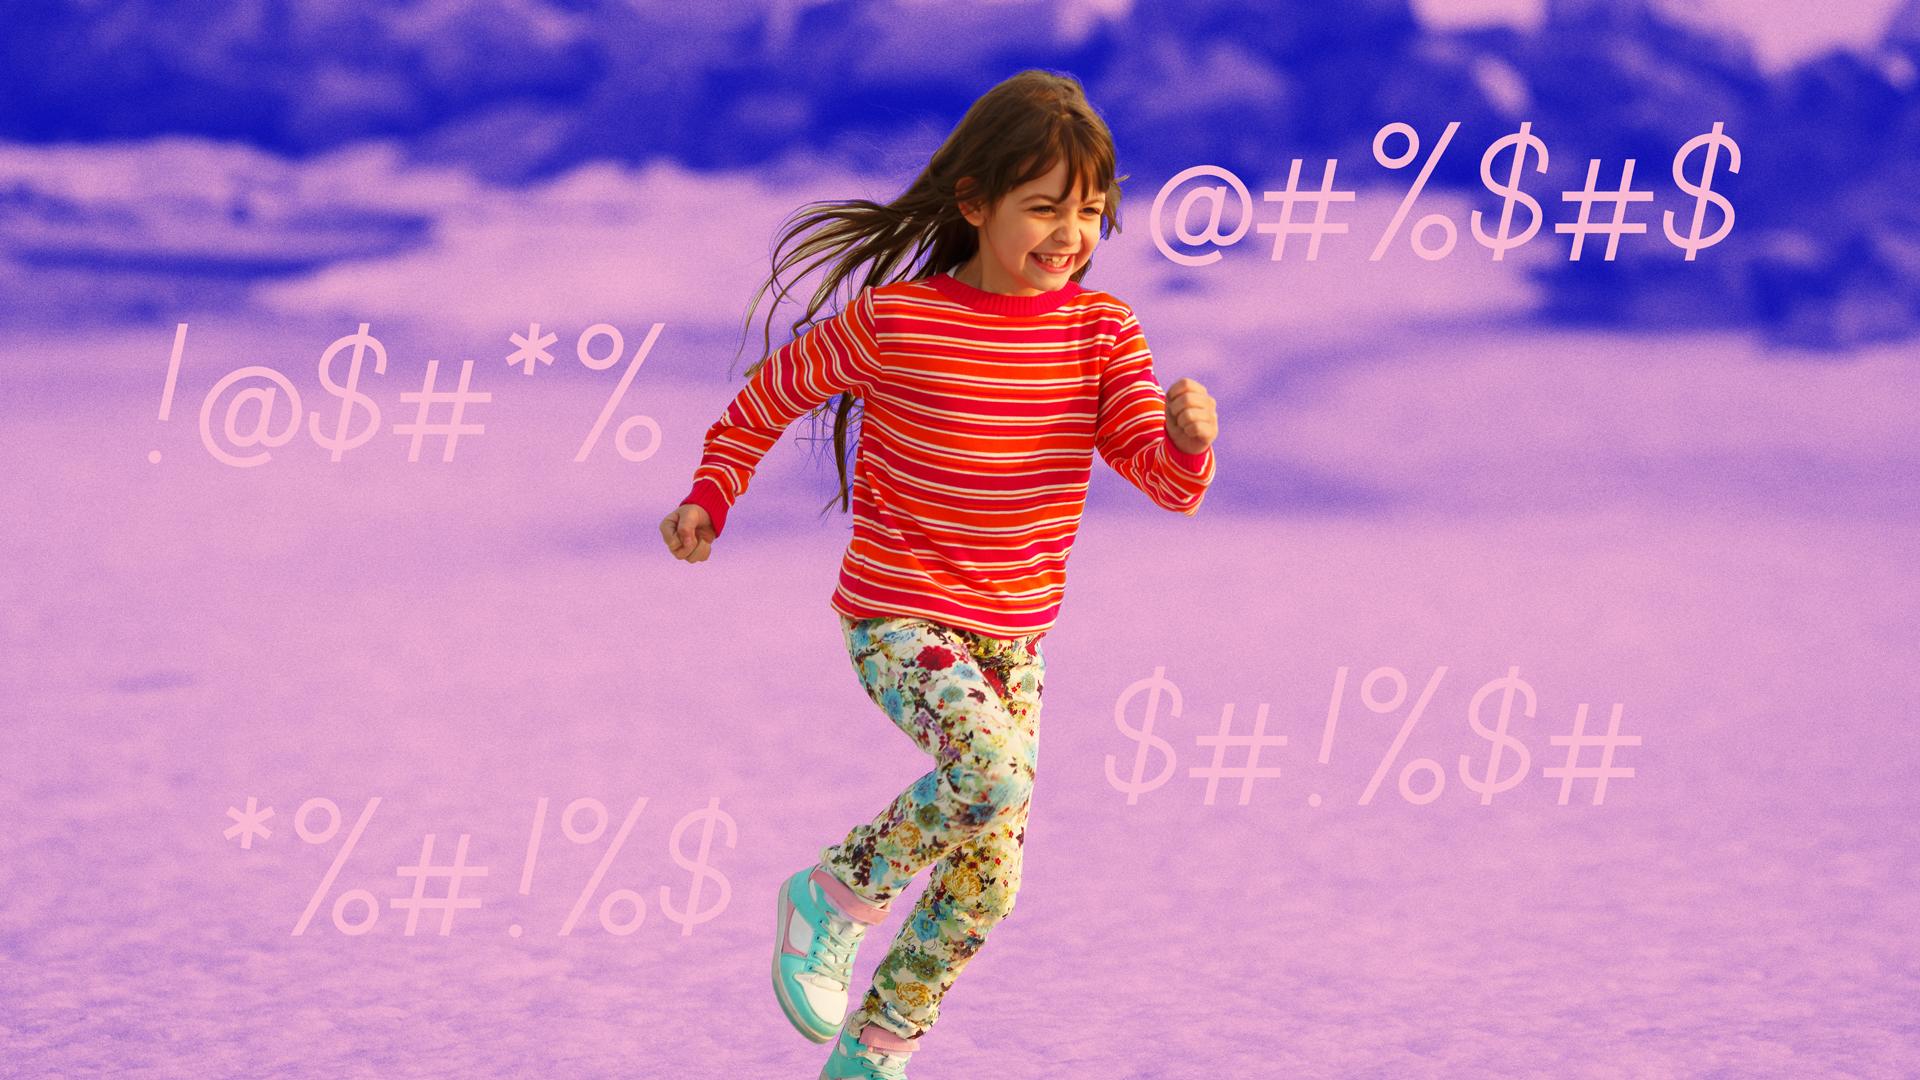 Girl running and swearing